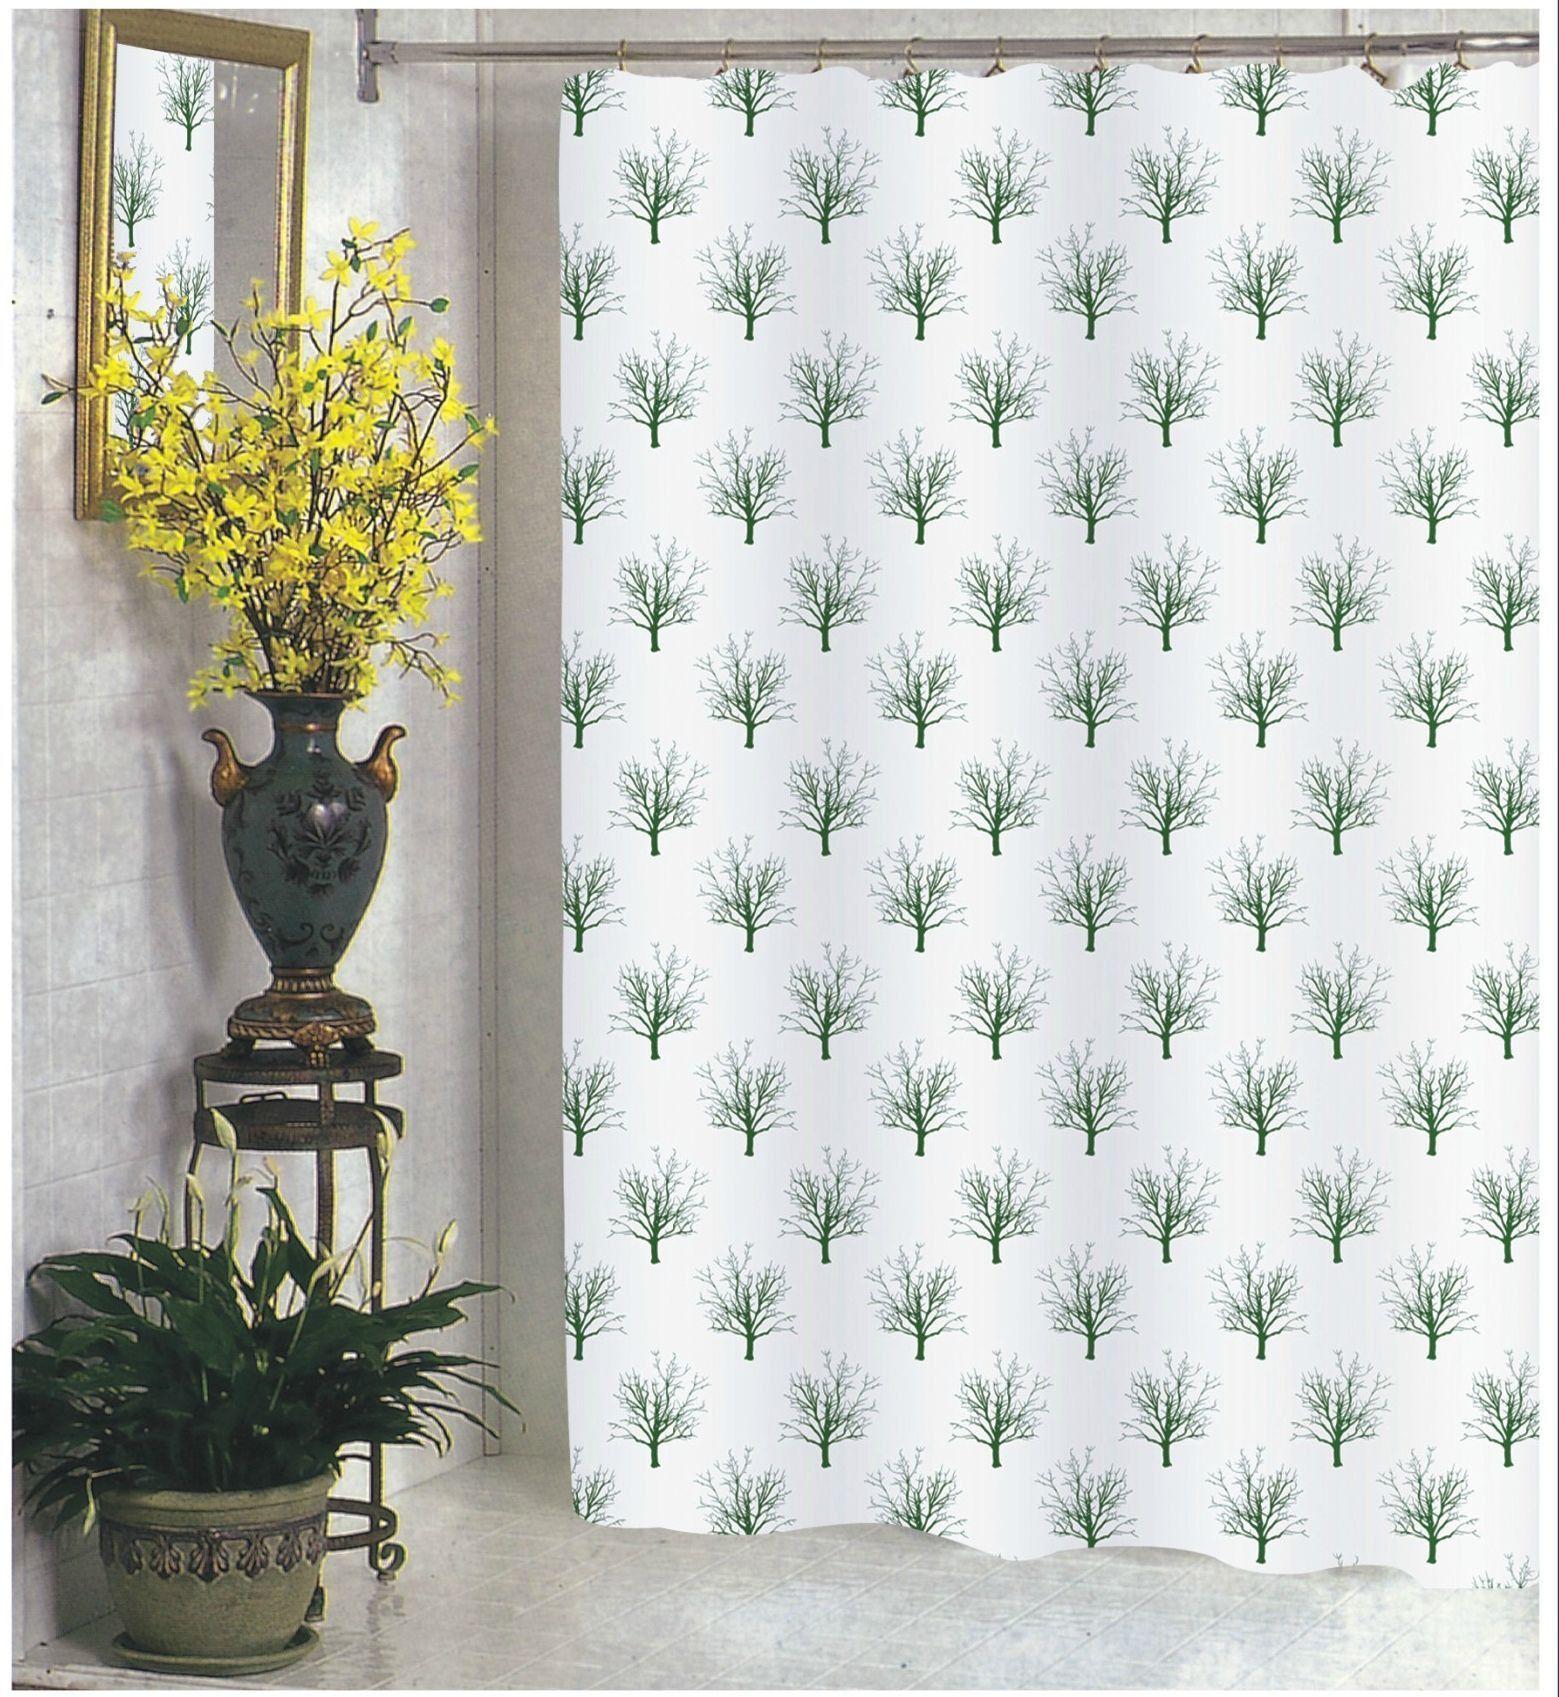 BenandJonah Collection Fabric Extra Long Shower Curtain 70 X 84 Autumn Tree